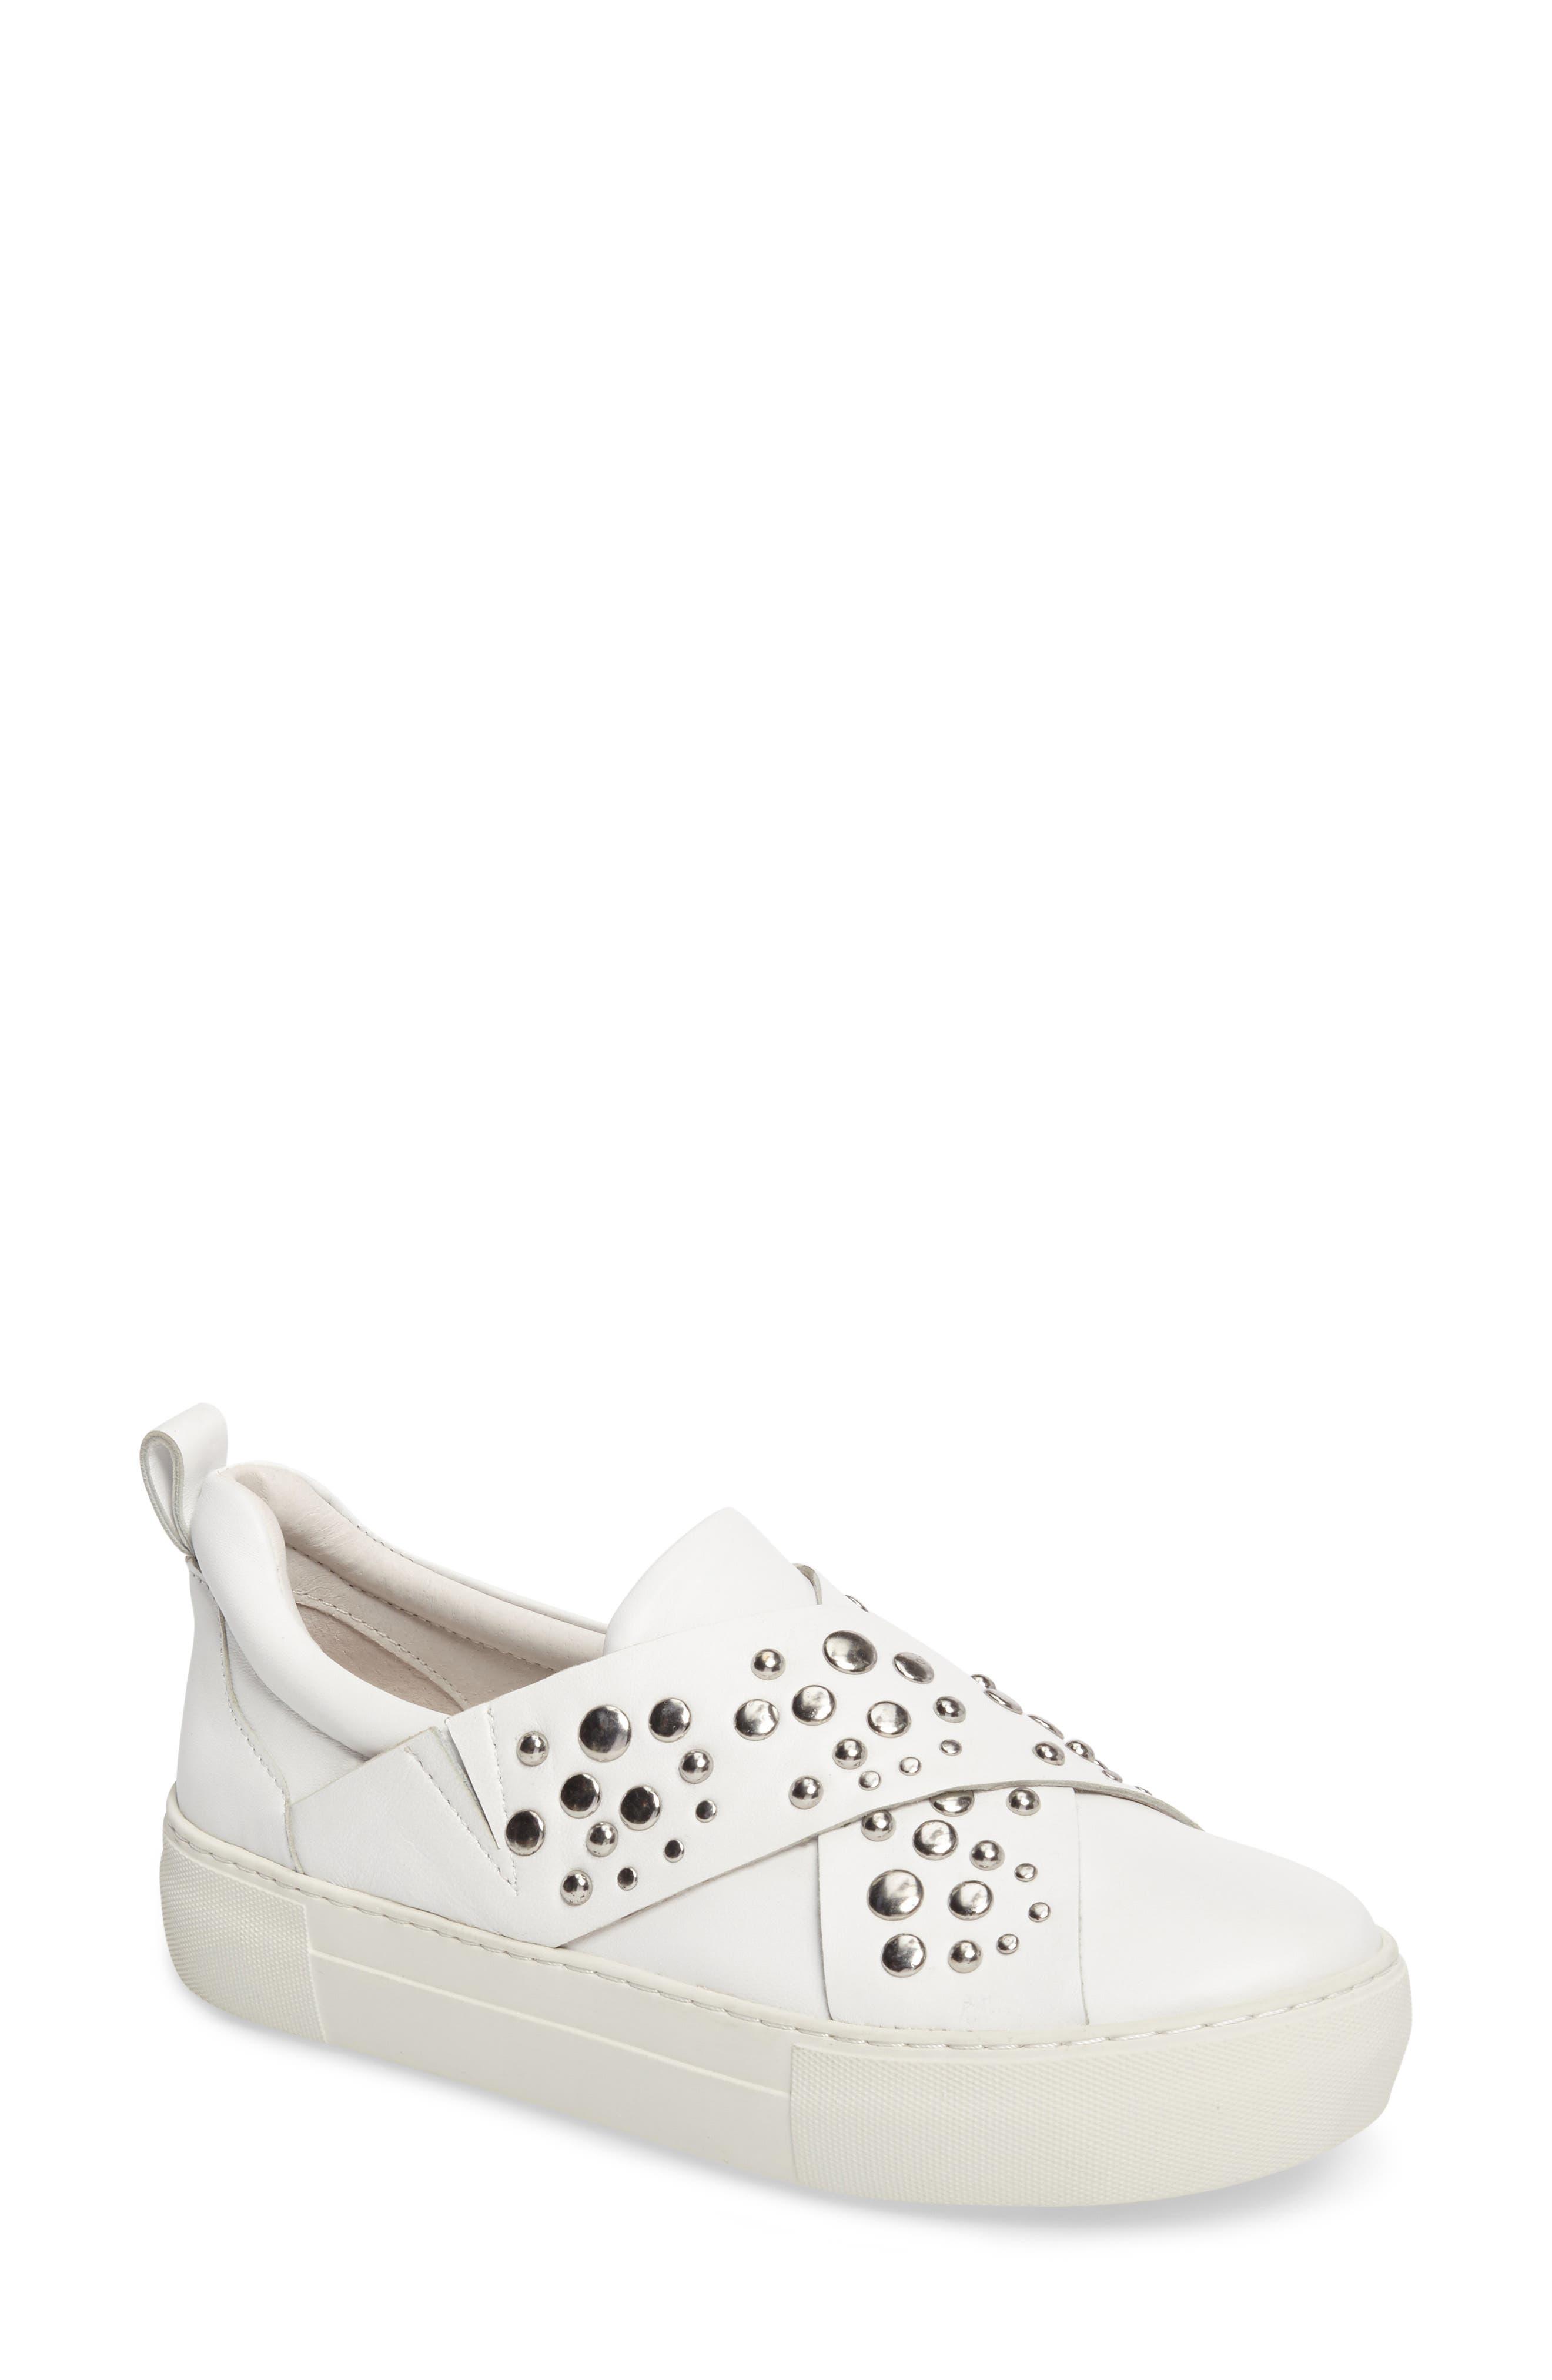 Main Image - JSlides Anteek Slip-On Sneaker (Women)